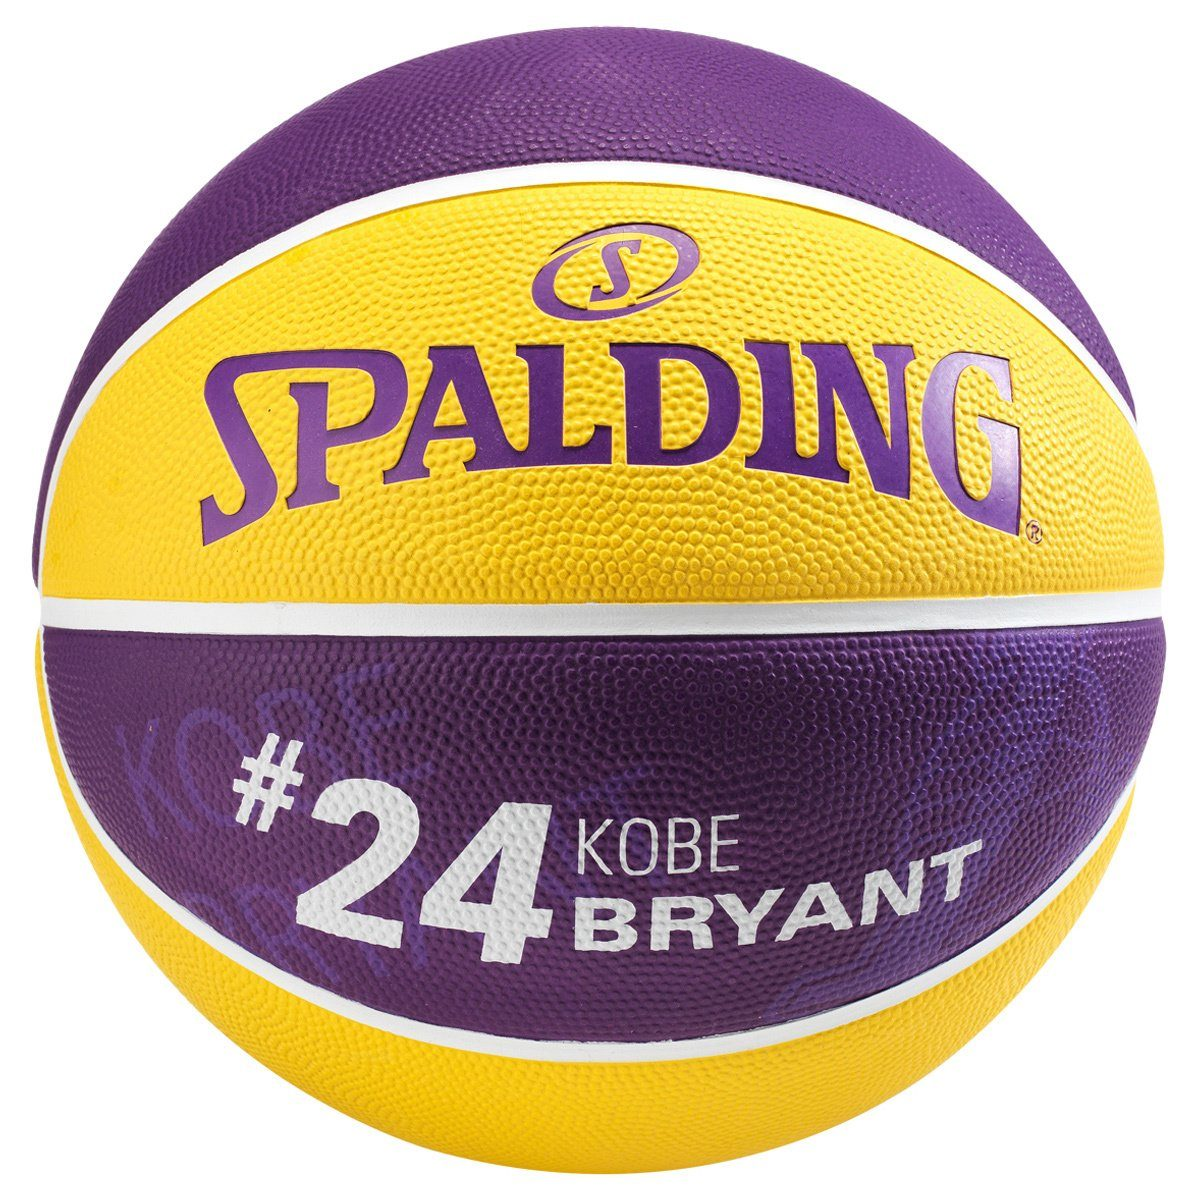 SPALDING NBA Player Kobe Bryant Basketball